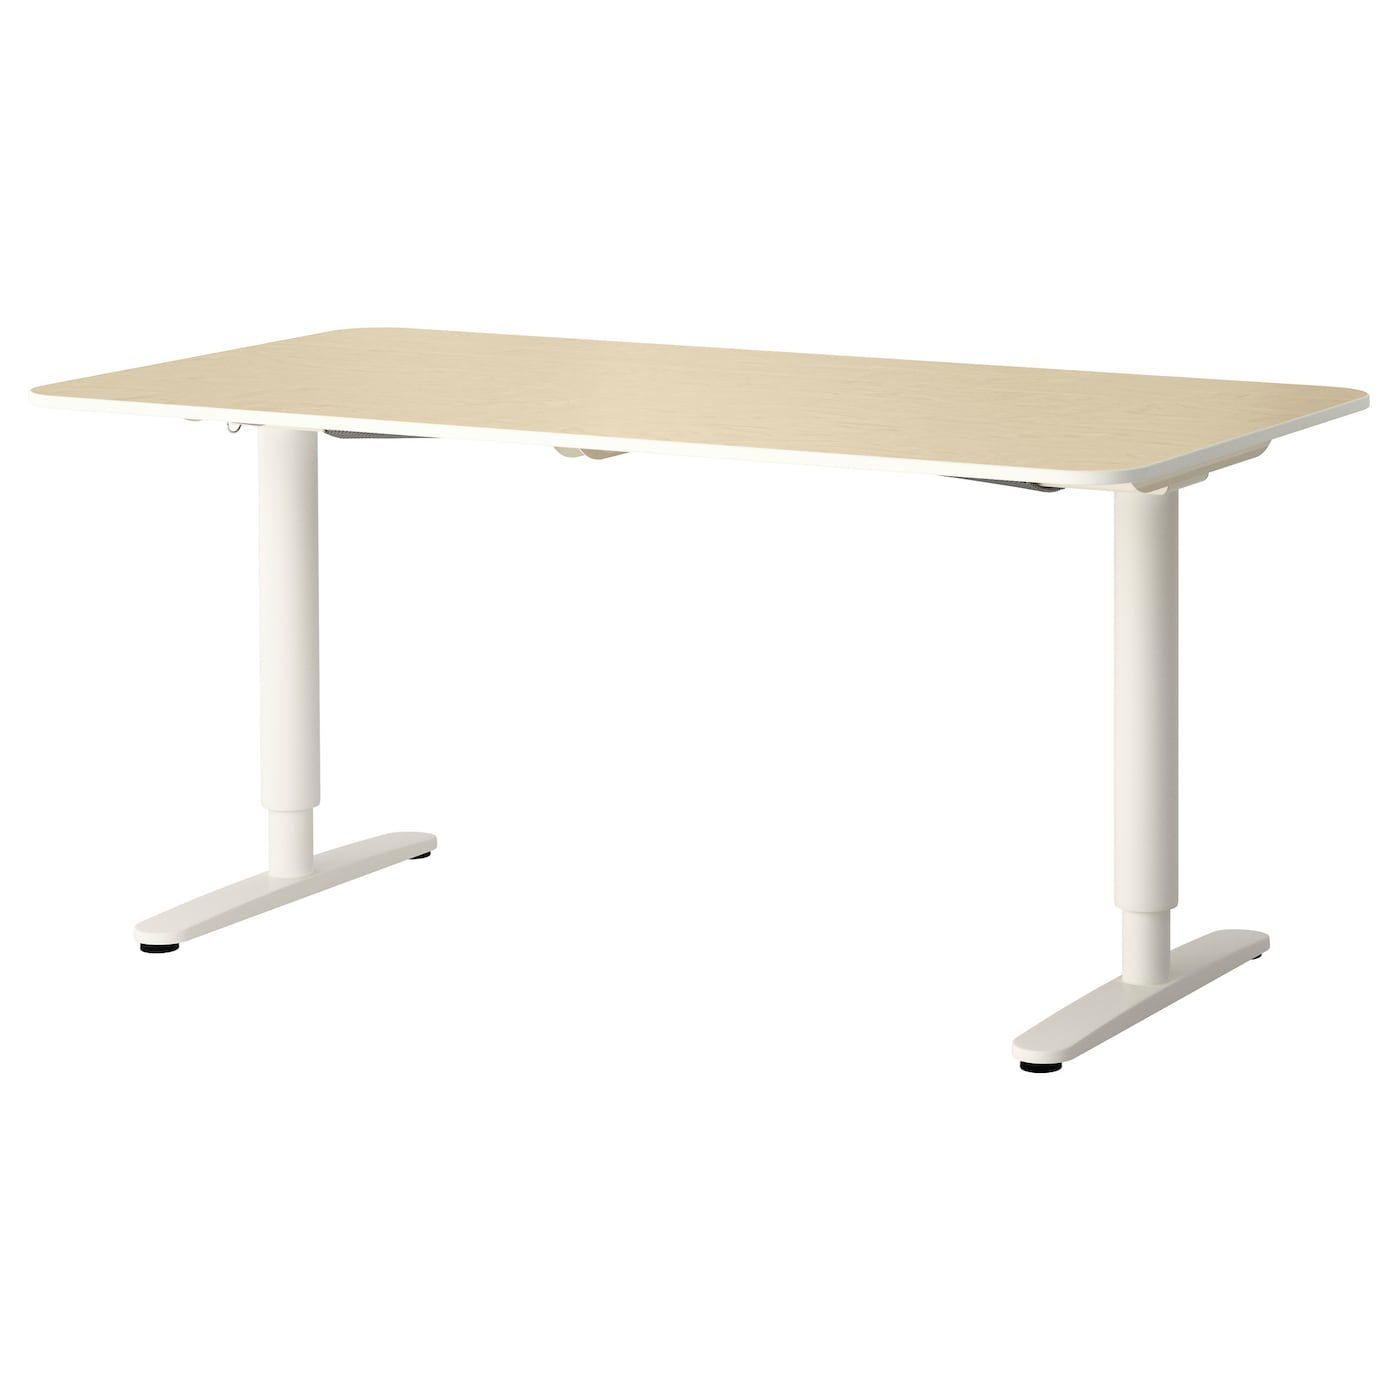 Bekant bureau zit sta berkenfineer wit 160x80 cm ikea for Bureau zit sta